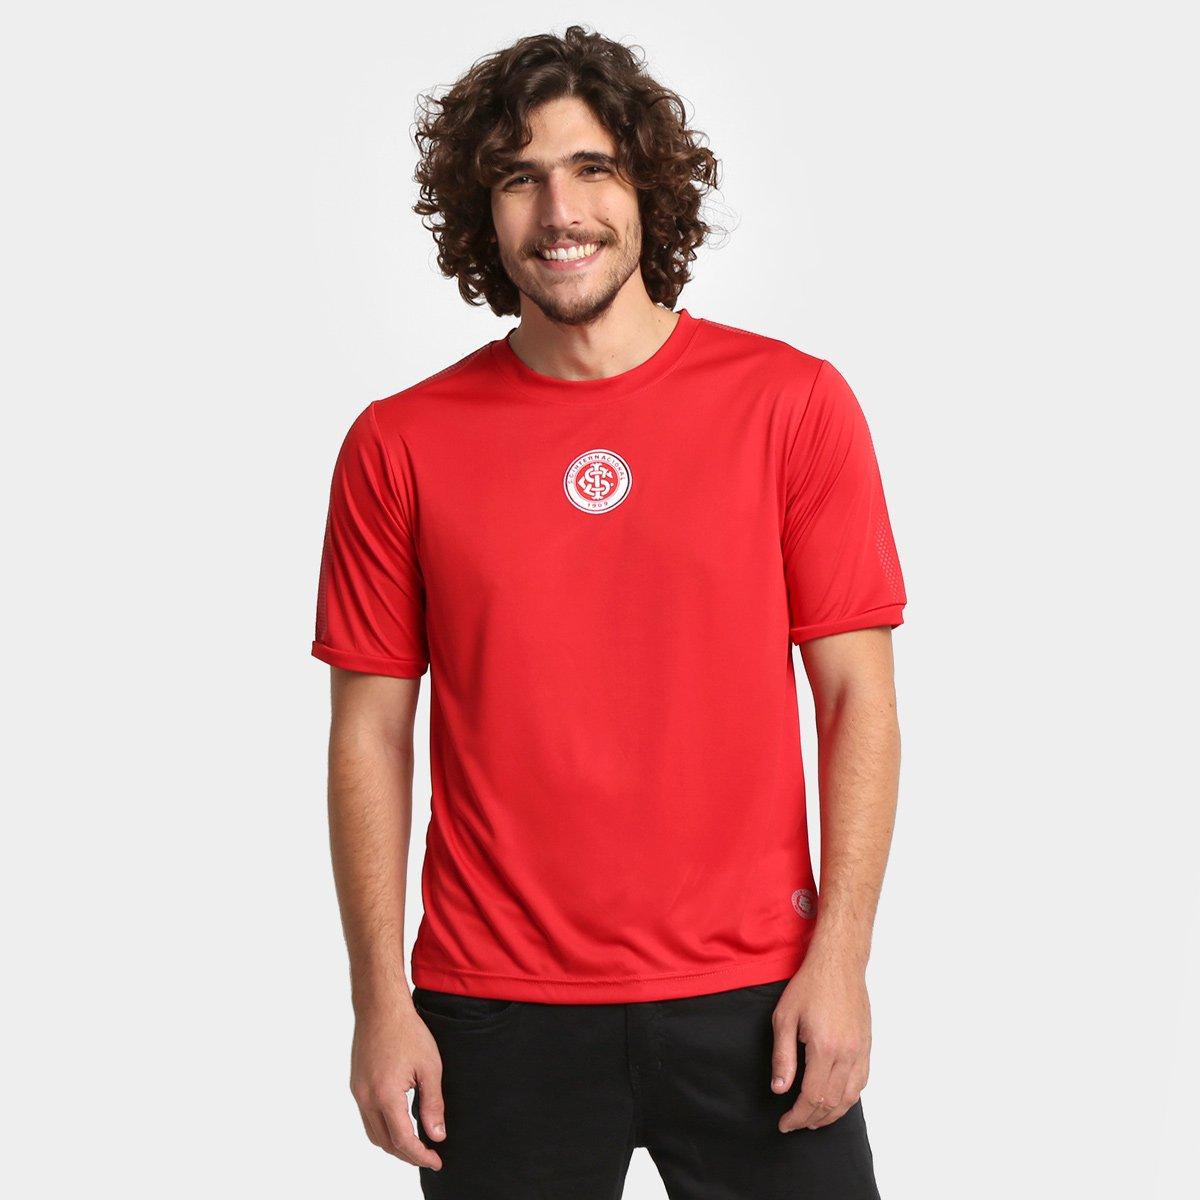 f58a14d8ba1 Camiseta Internacional Dry Masculina - Compre Agora